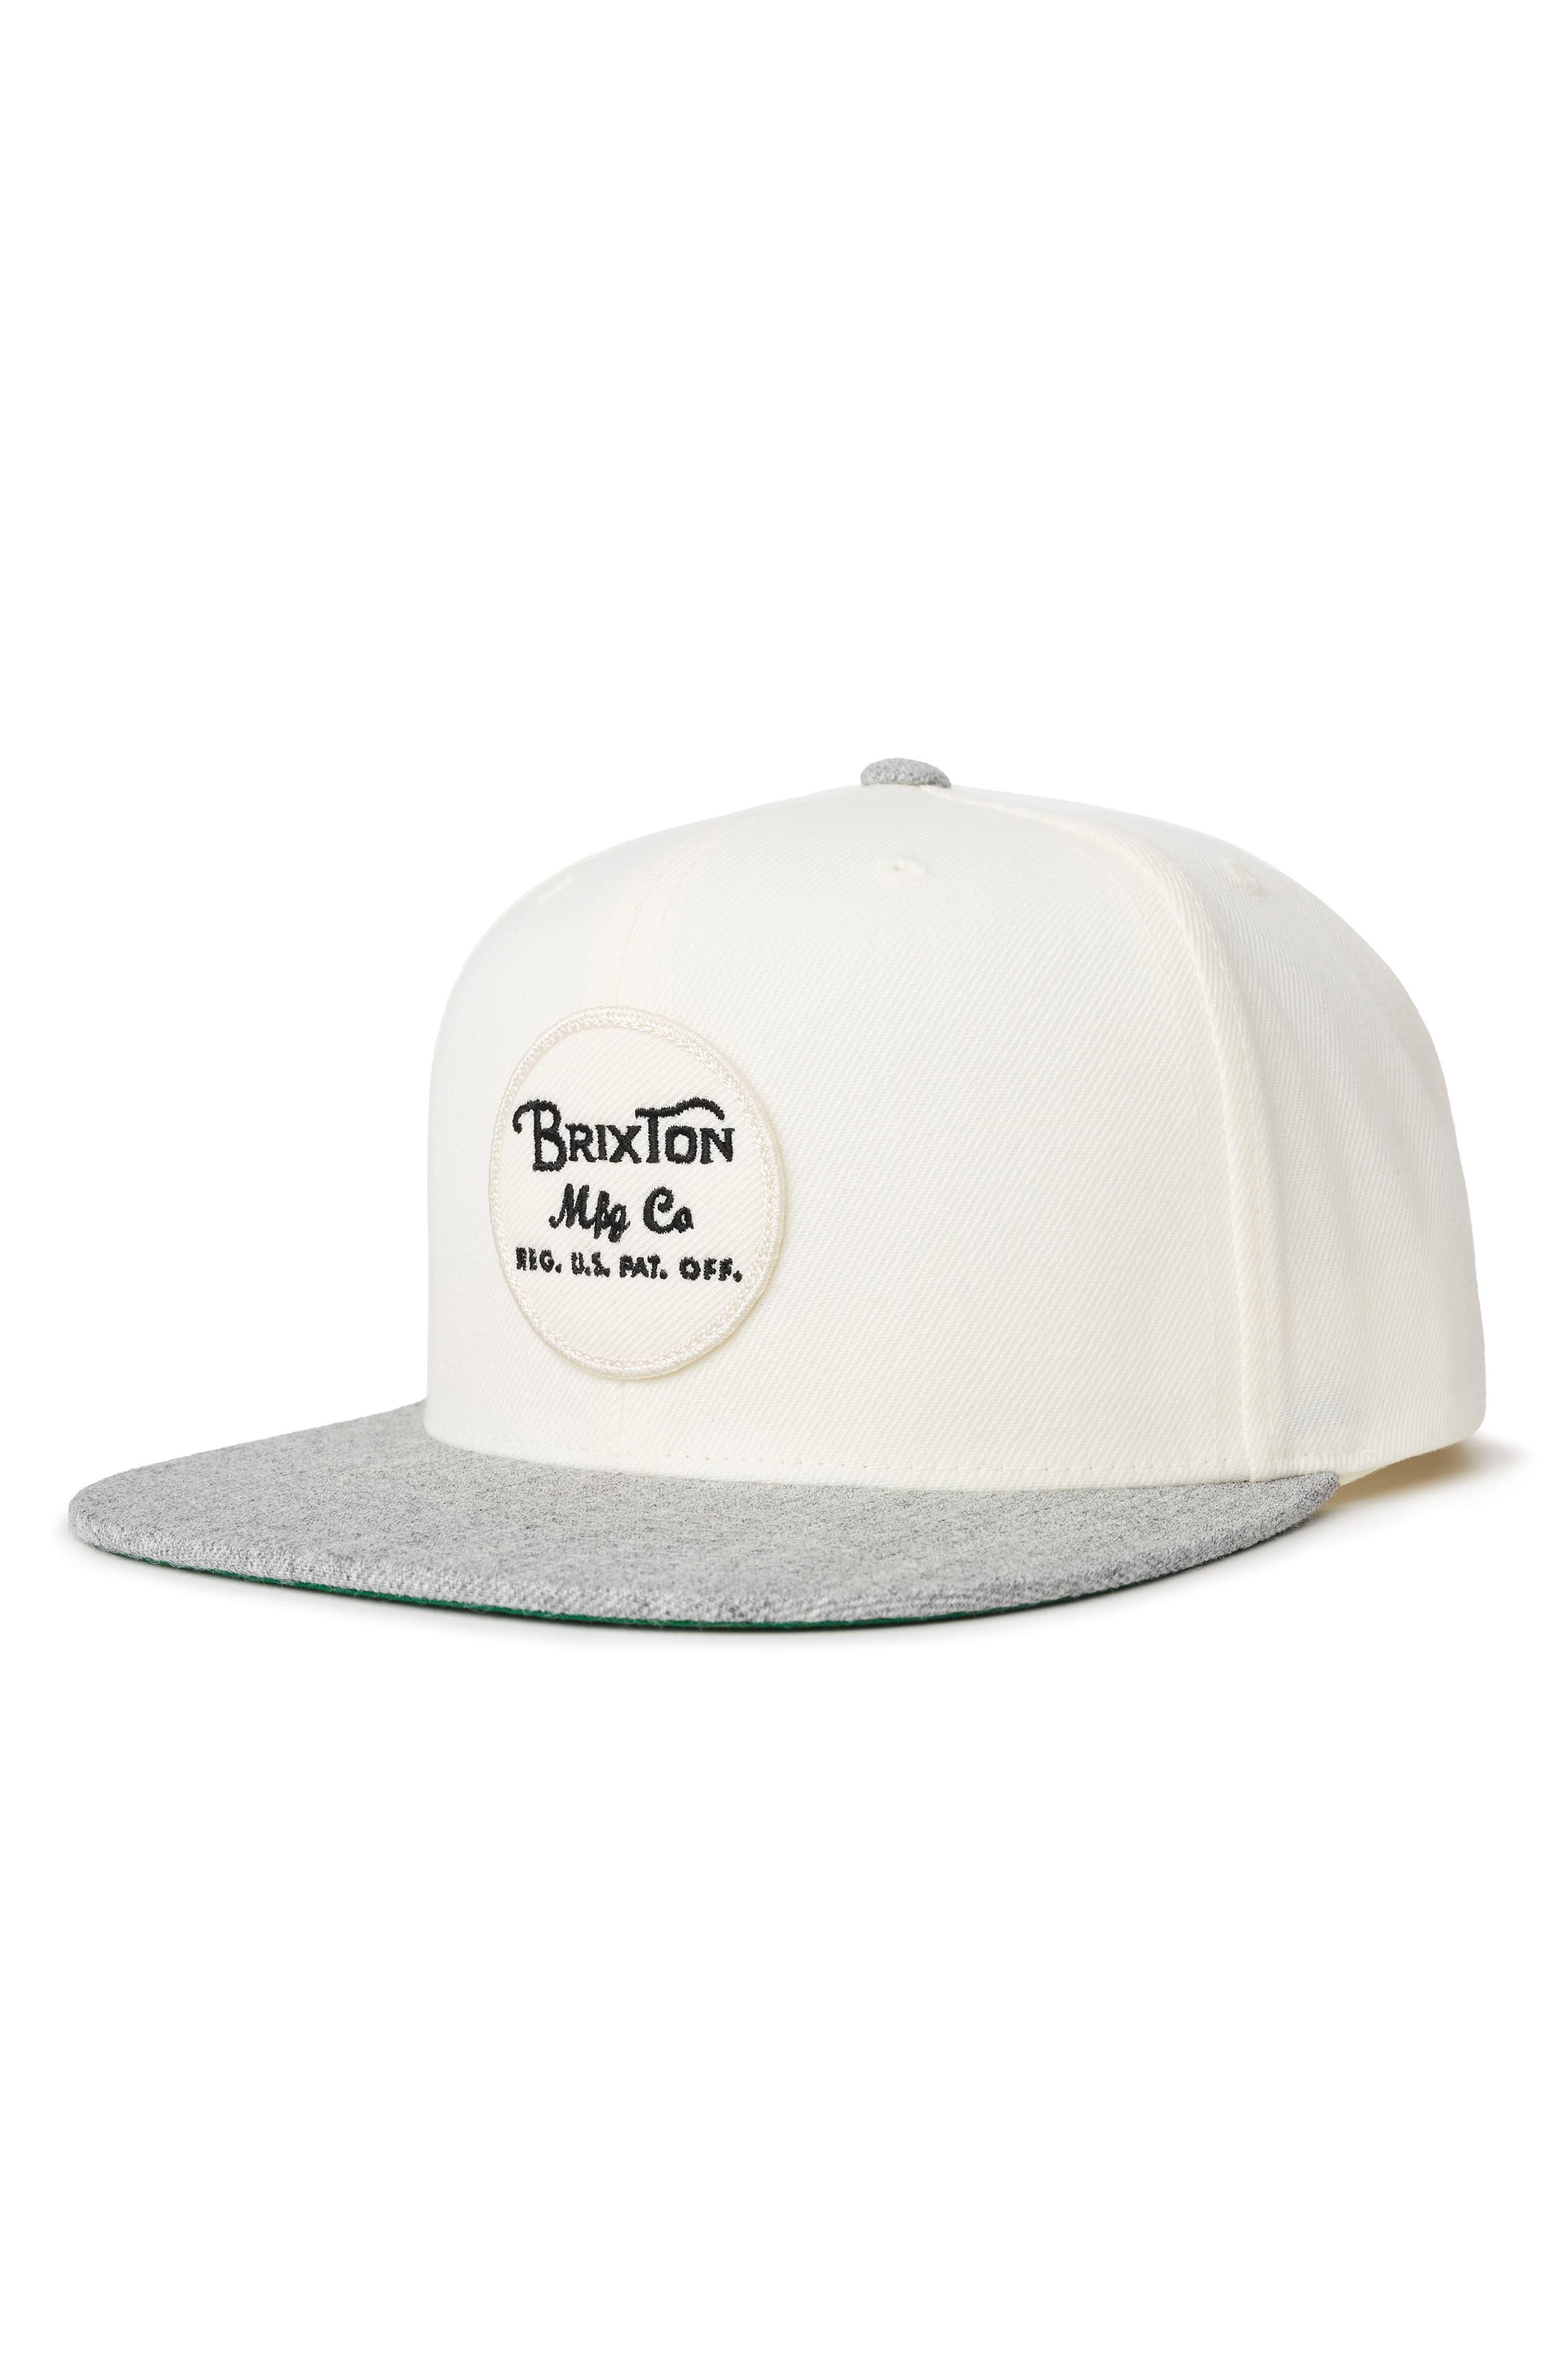 45620294194 Brixton 'wheeler' Snapback Cap in Gray for Men - Lyst